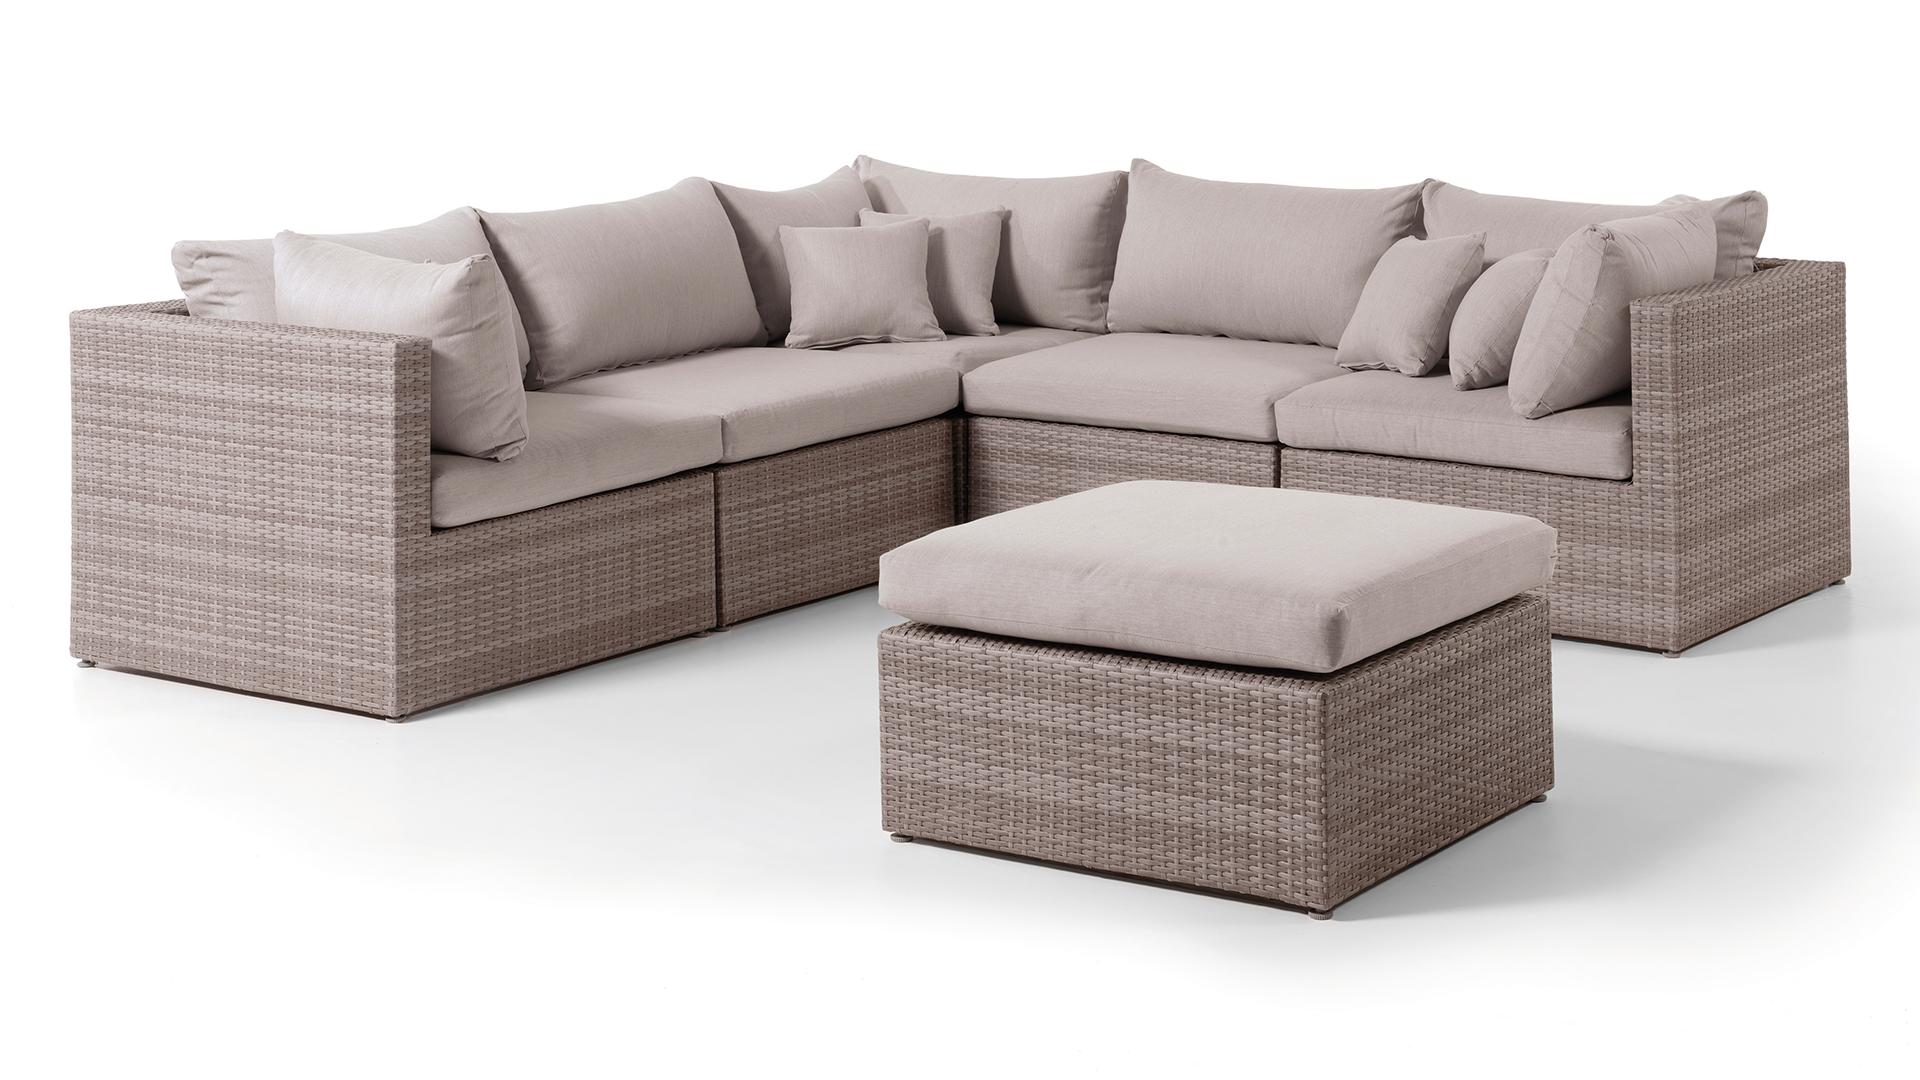 Wicker Loungeset Ravenna 255x255cm